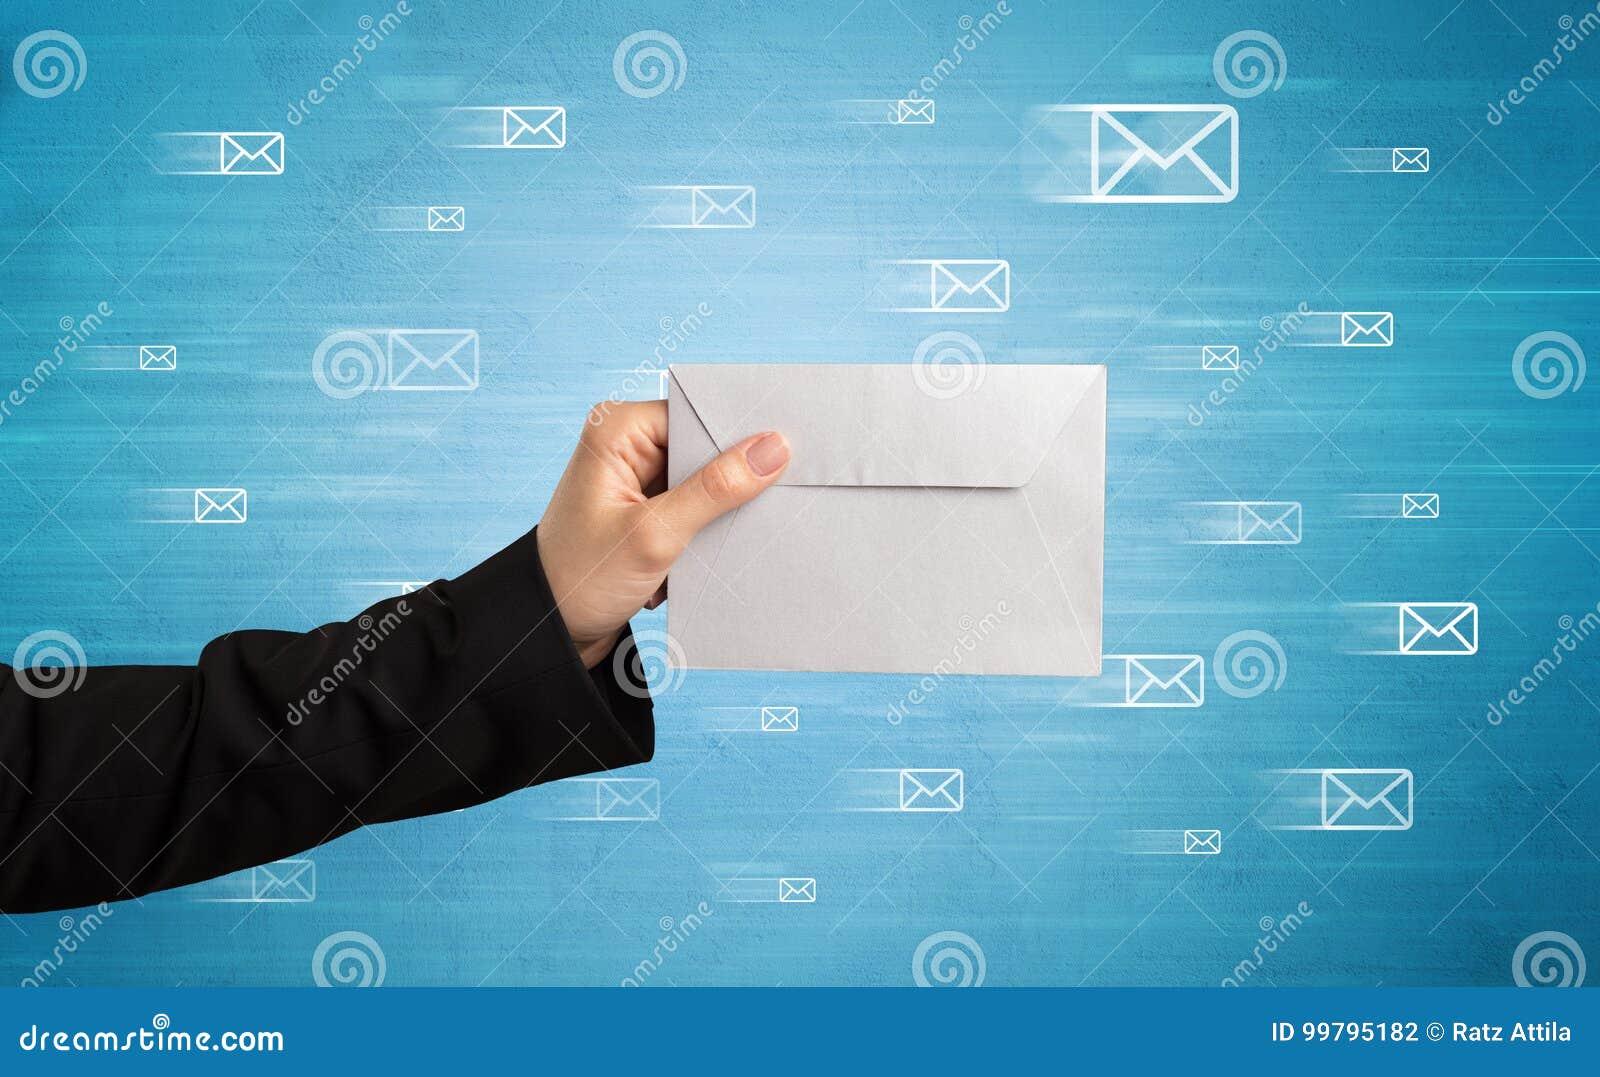 Hand holding envelope with message symbols around